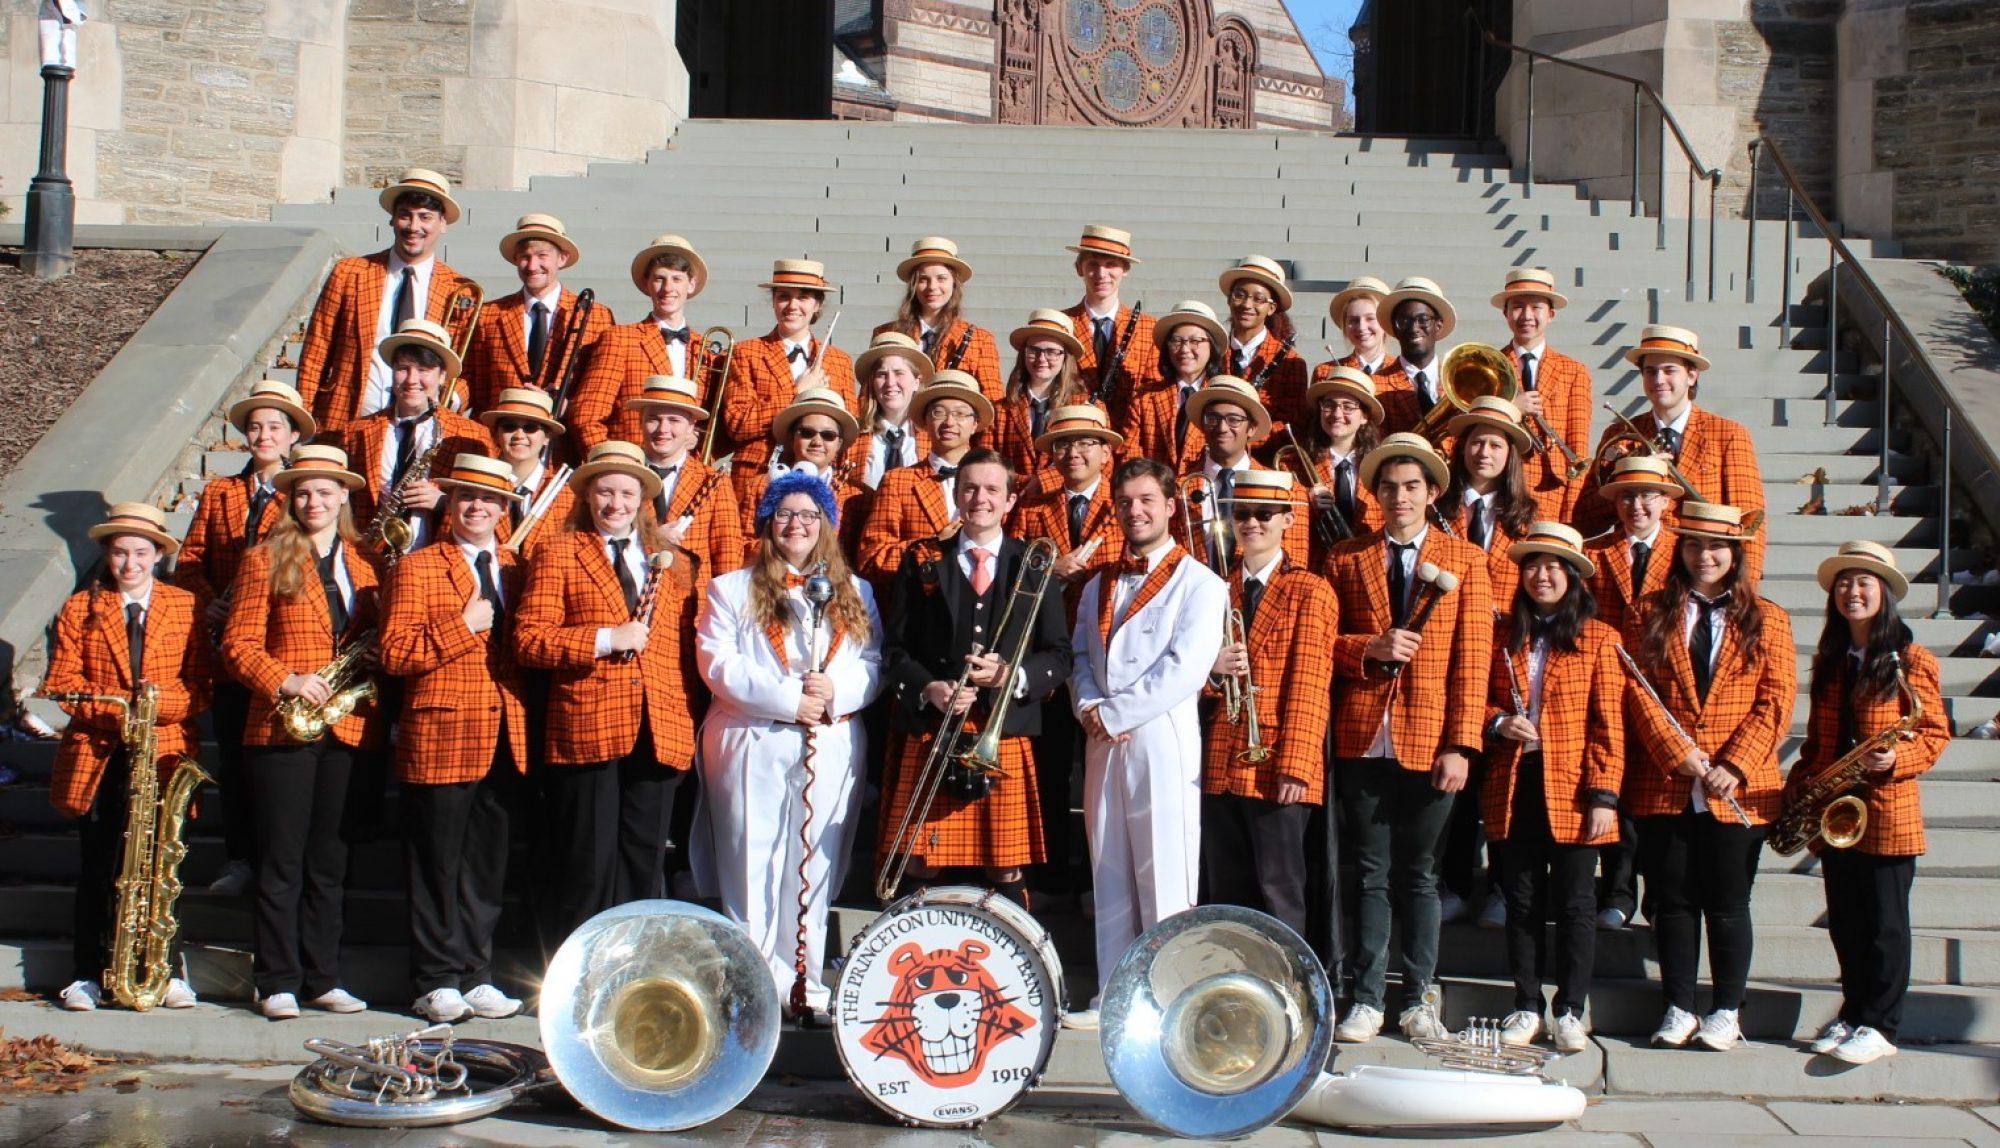 Princeton University Band